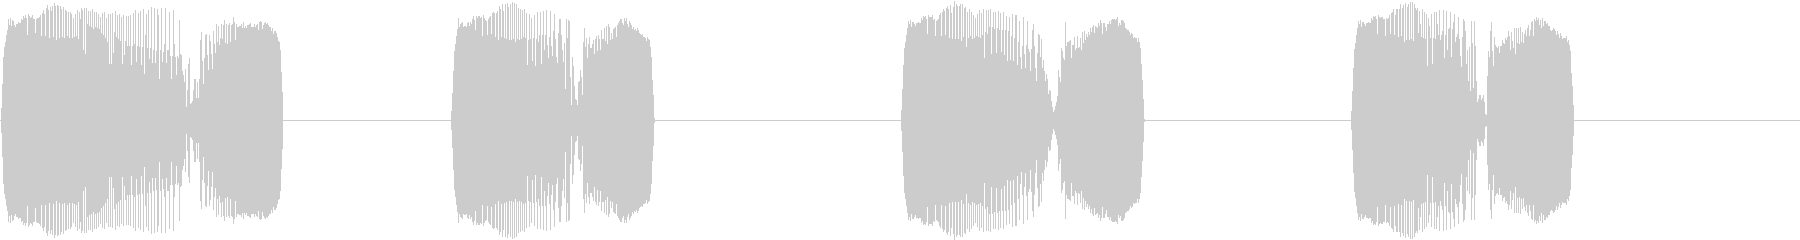 DJプレイ スクラッチ・ノイズ 13の未再生の波形